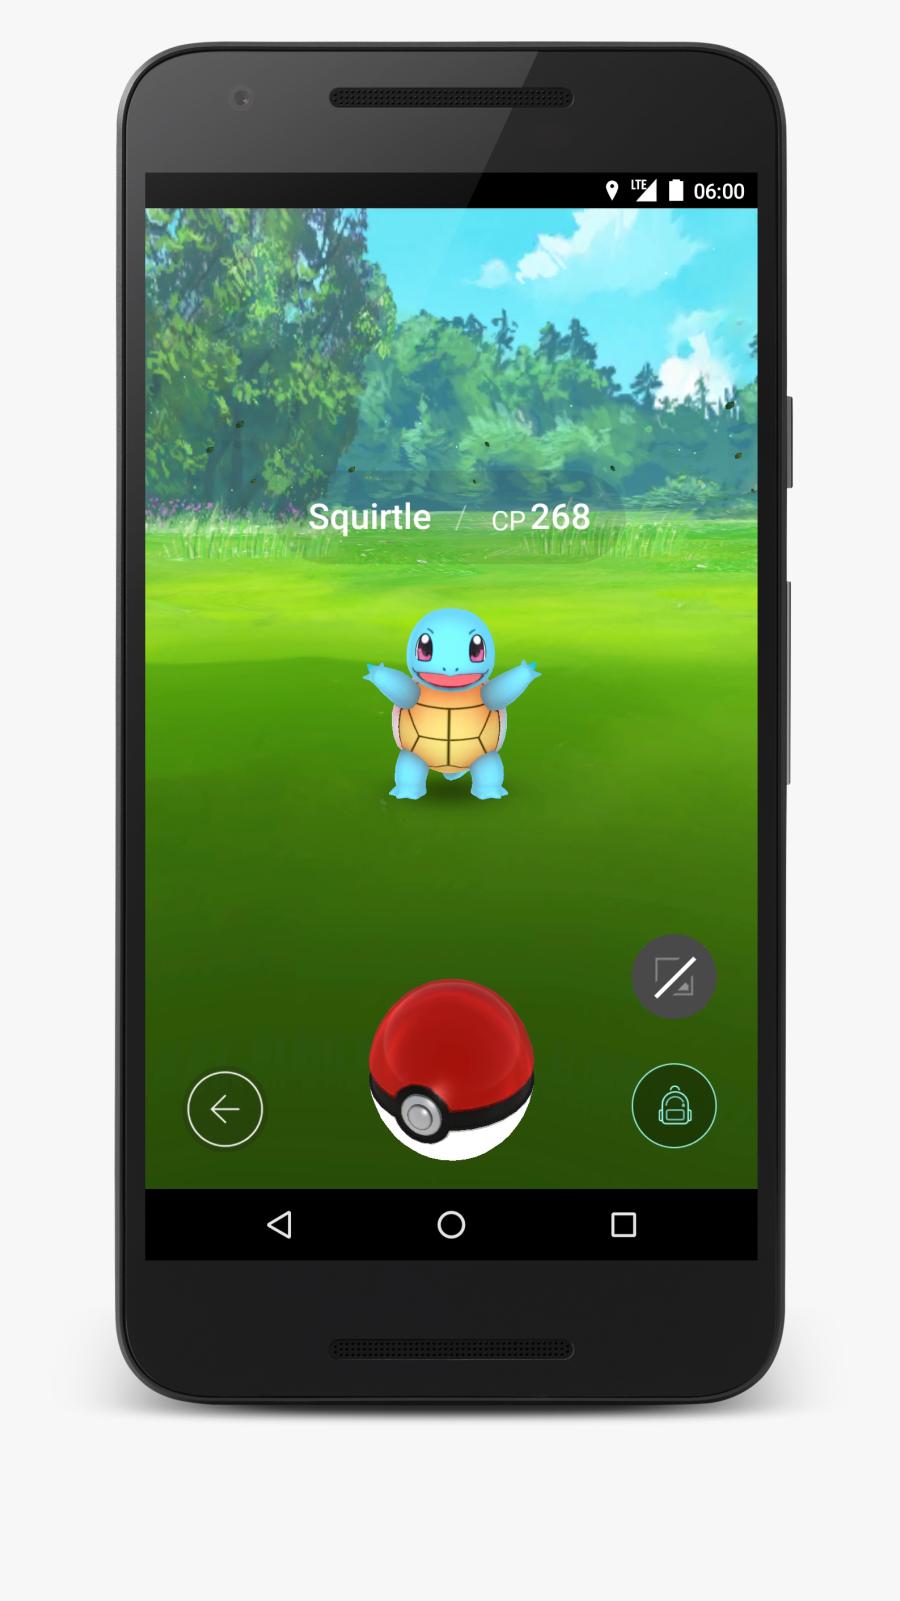 Clip Art Pokemon Go Gear S3 - Pokémon Go Gameplay, Transparent Clipart